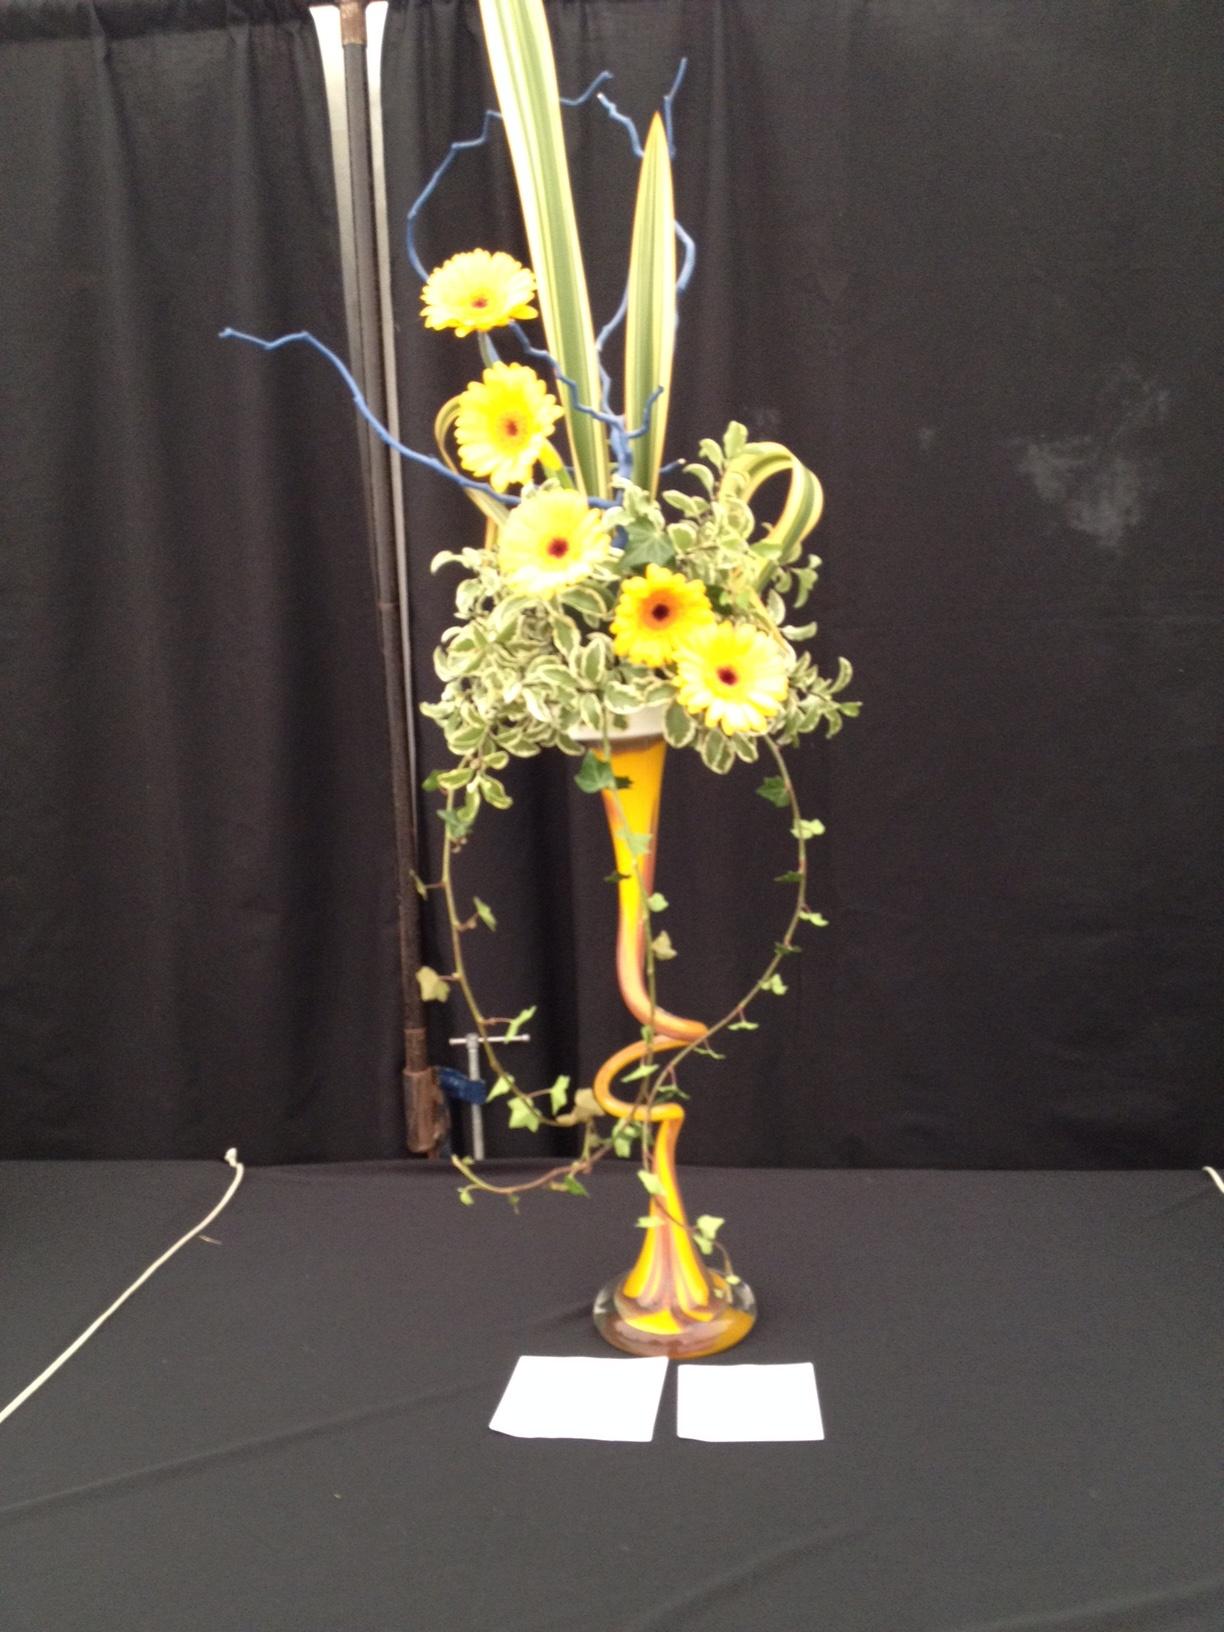 Floral Art entry 2016